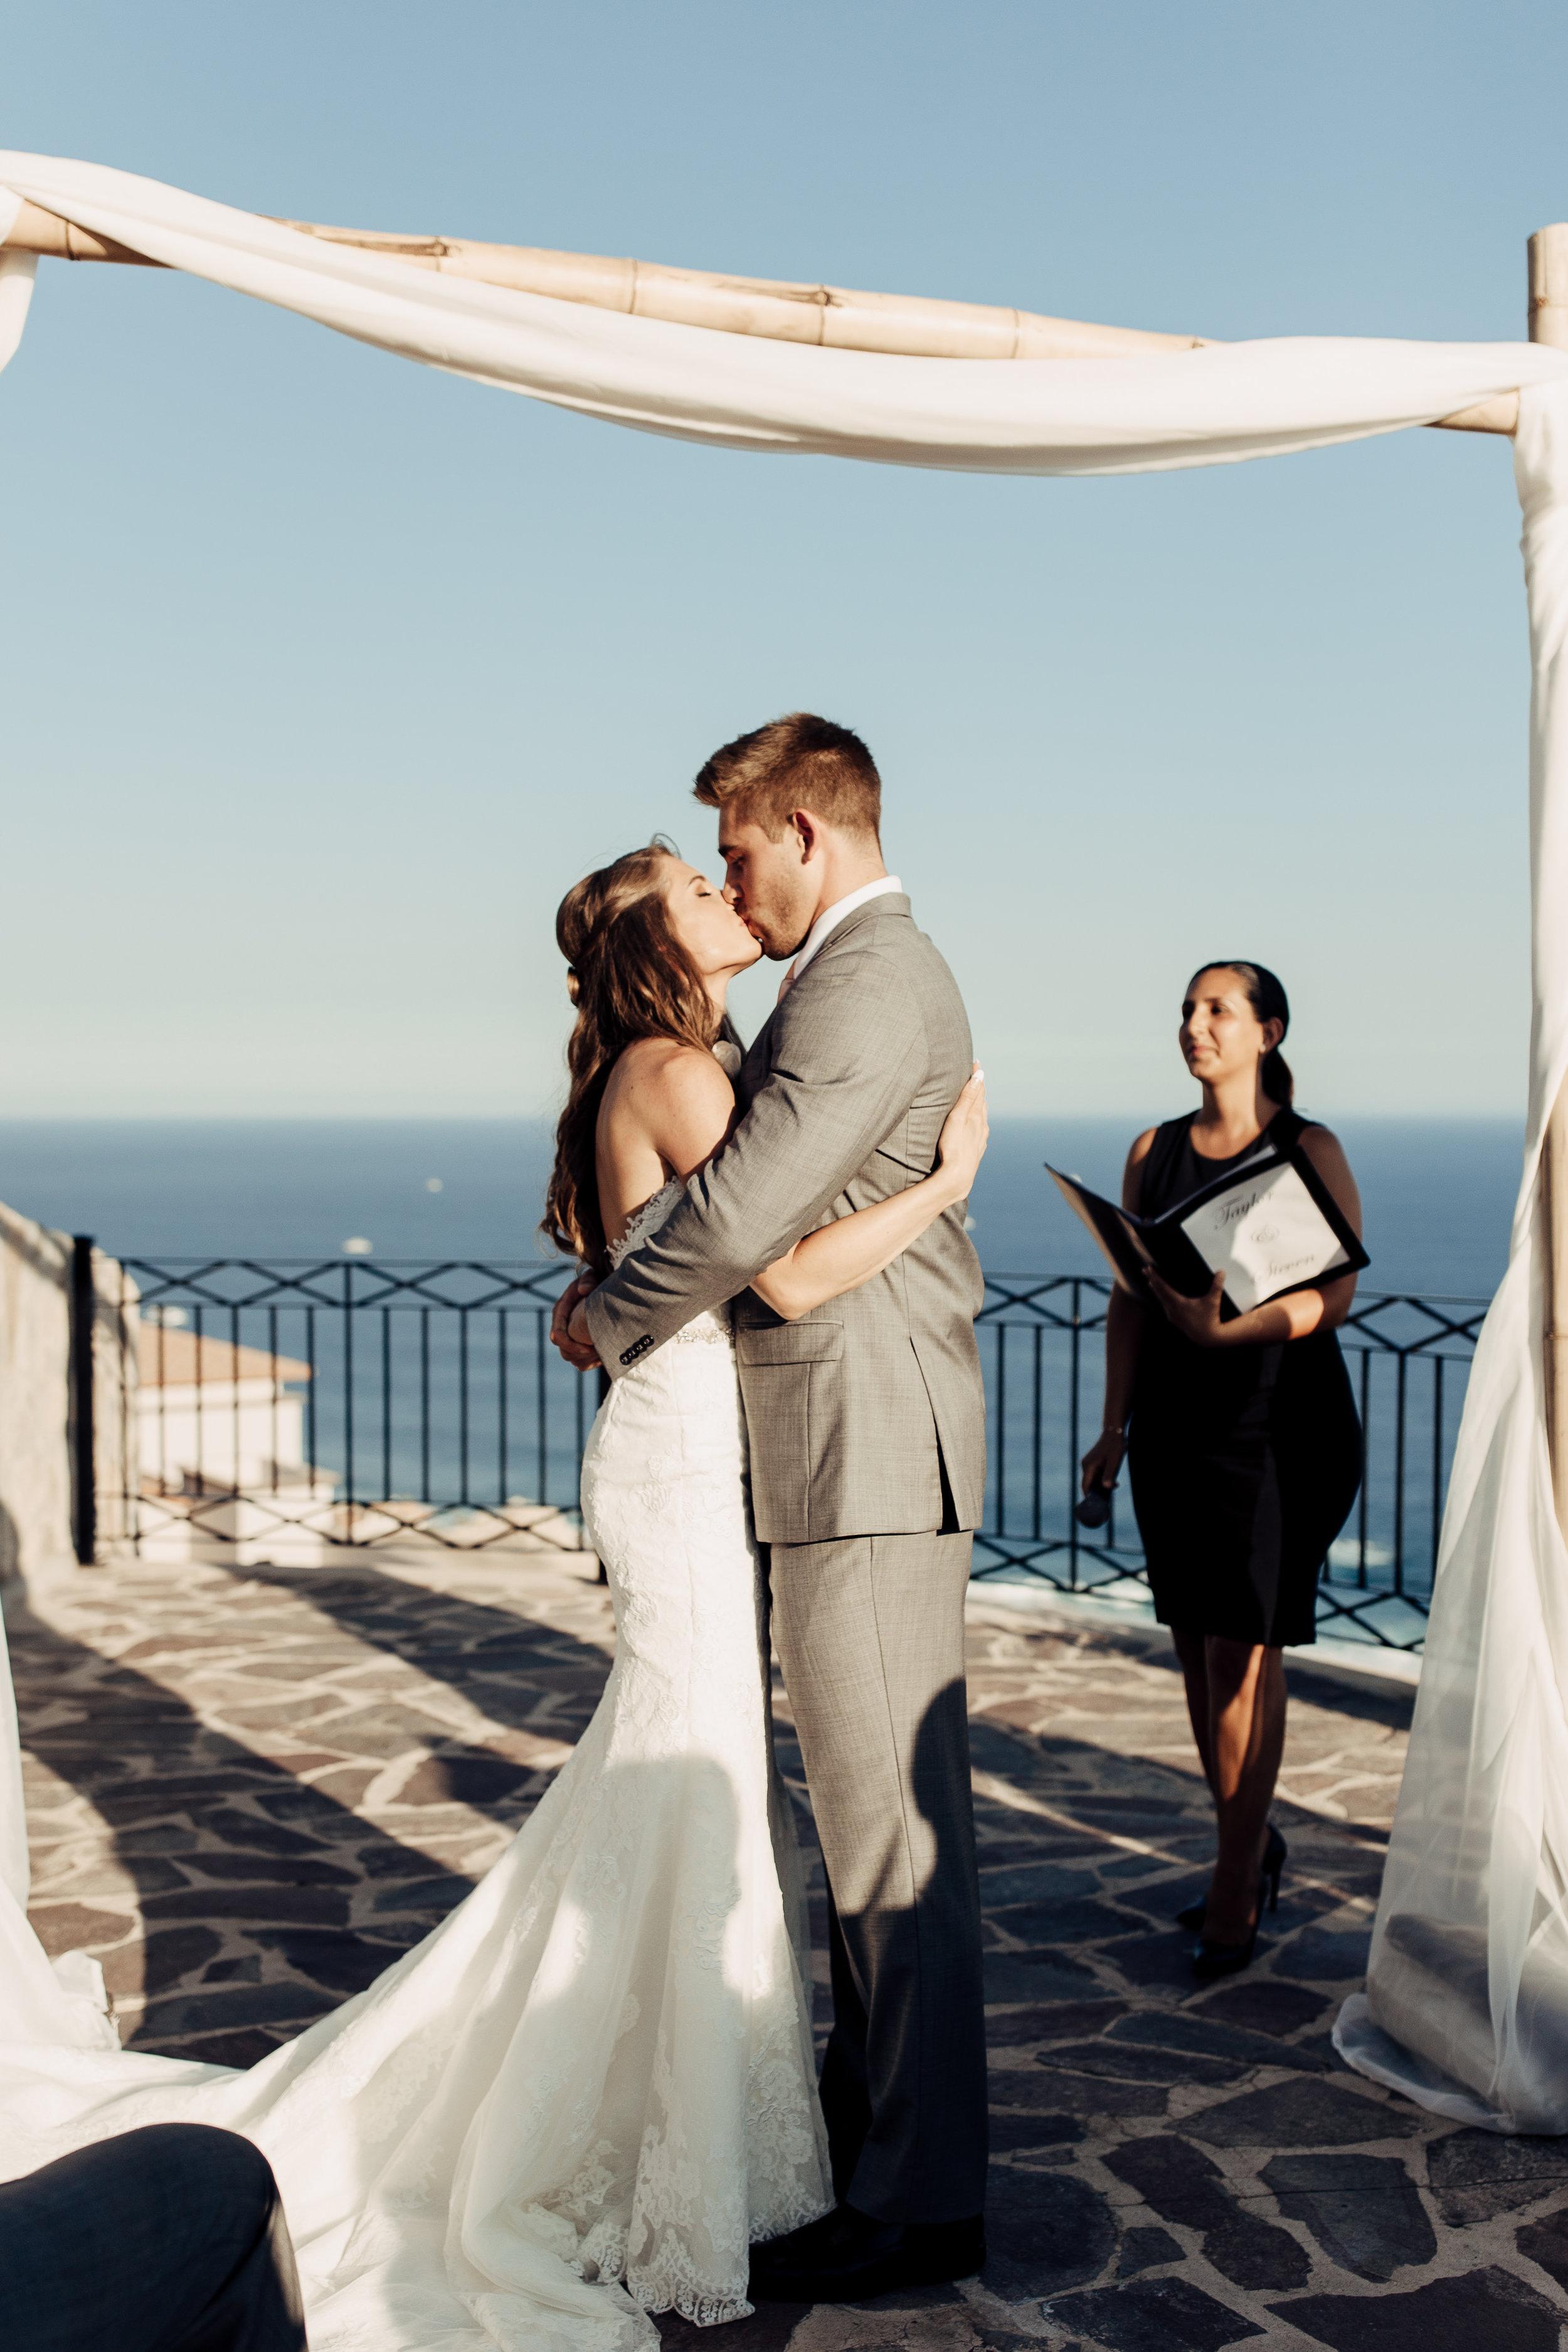 pueblo-bonito-sunset-beach-wedding-cabo-san-lucas337.jpg